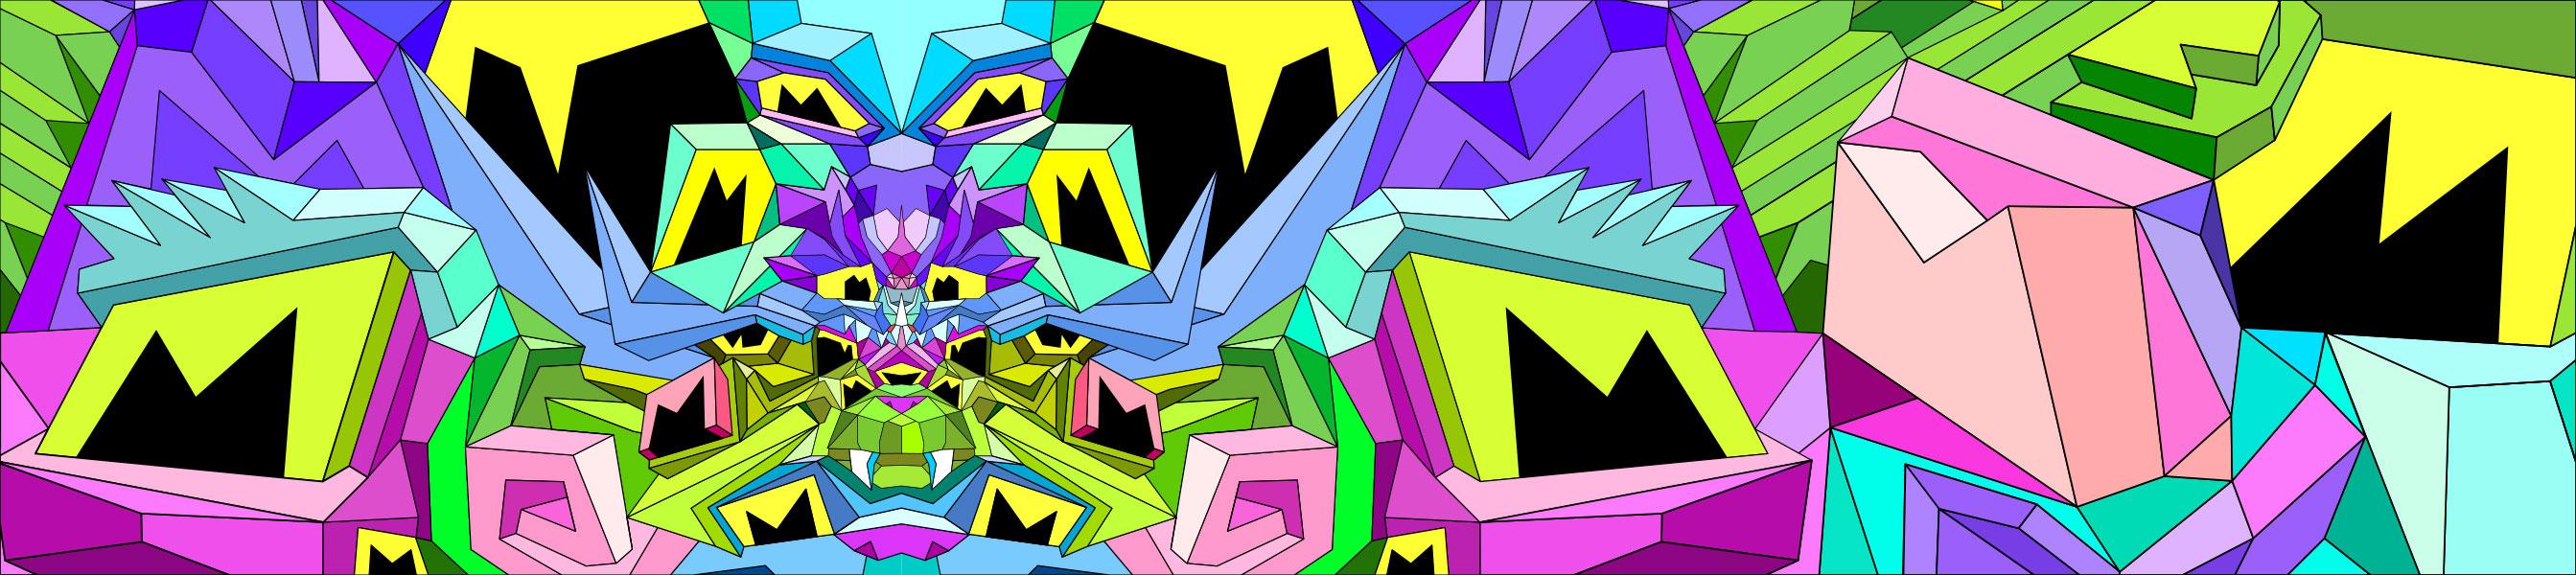 Crystak King Destiny digital art